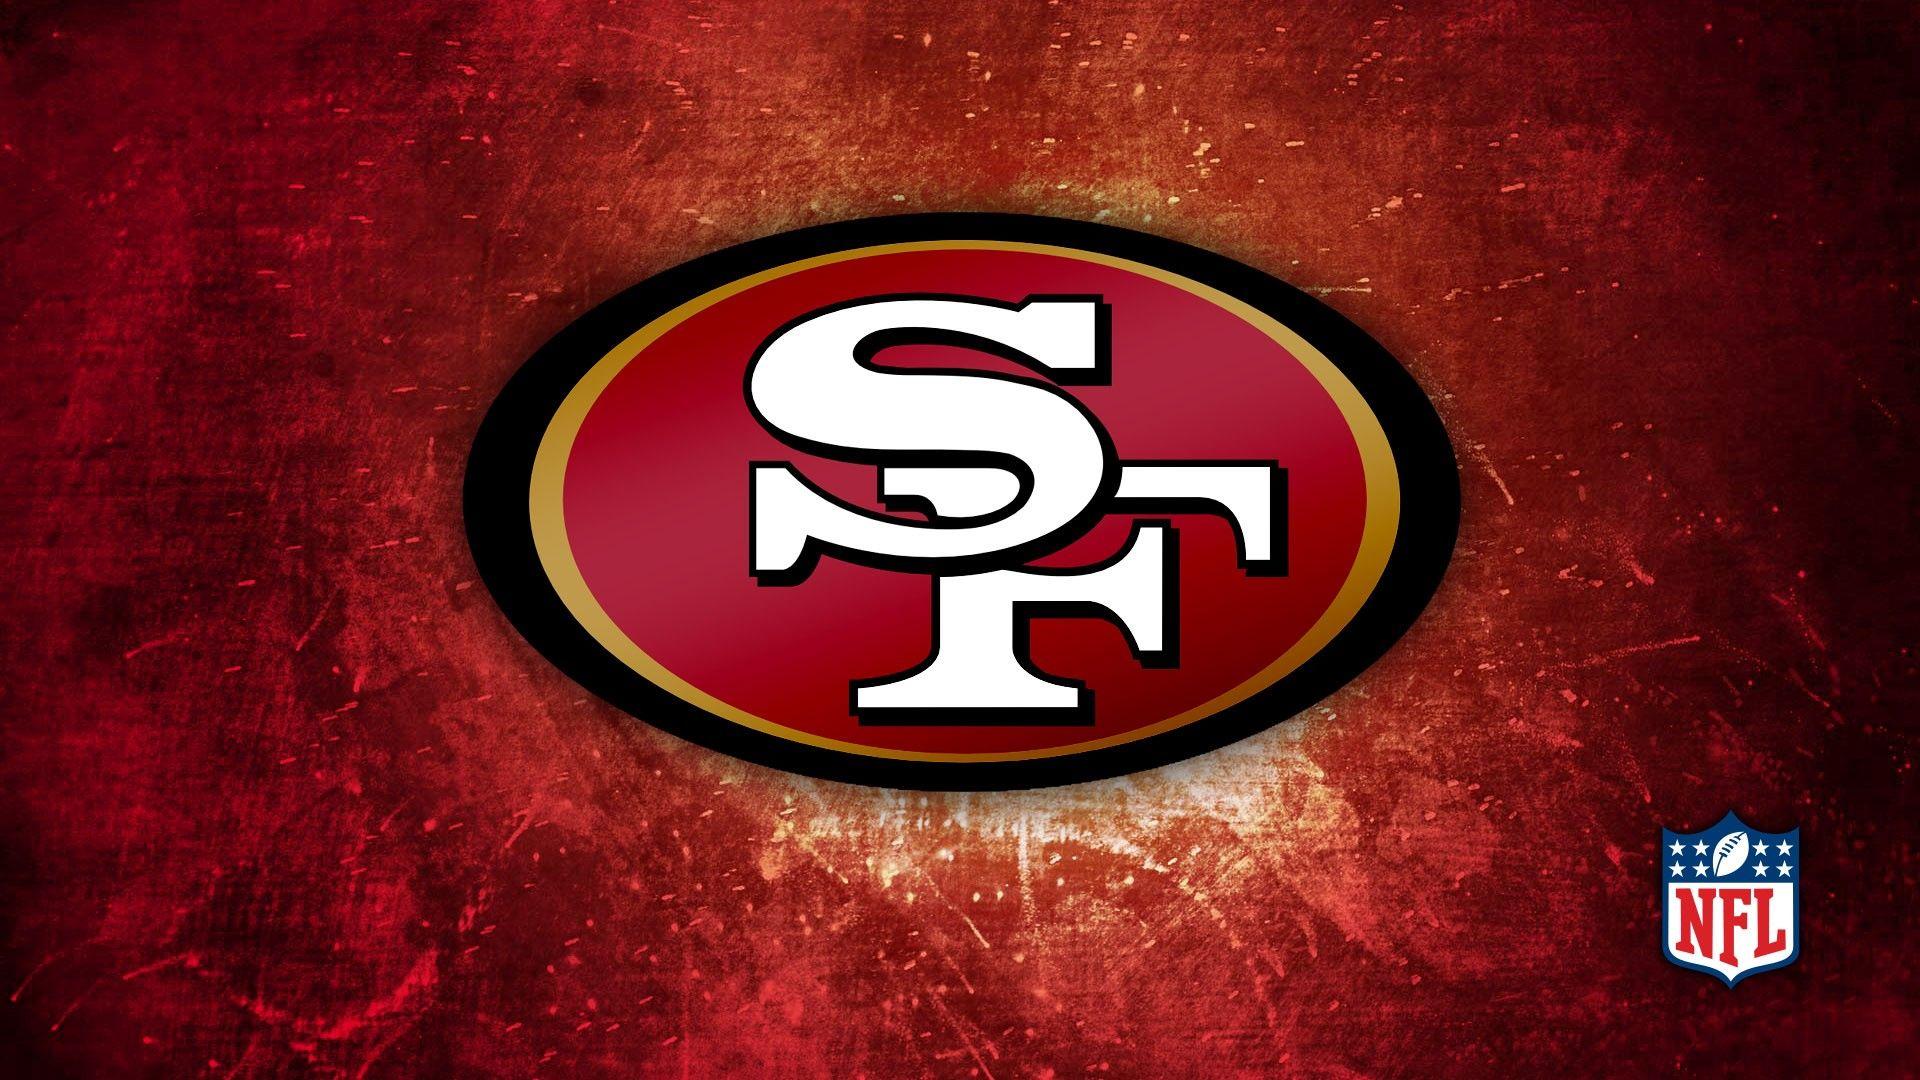 Hd Backgrounds San Francisco 49ers 2021 Nfl Football Wallpapers San Francisco 49ers Logo San Francisco 49ers Nfl Football Wallpaper